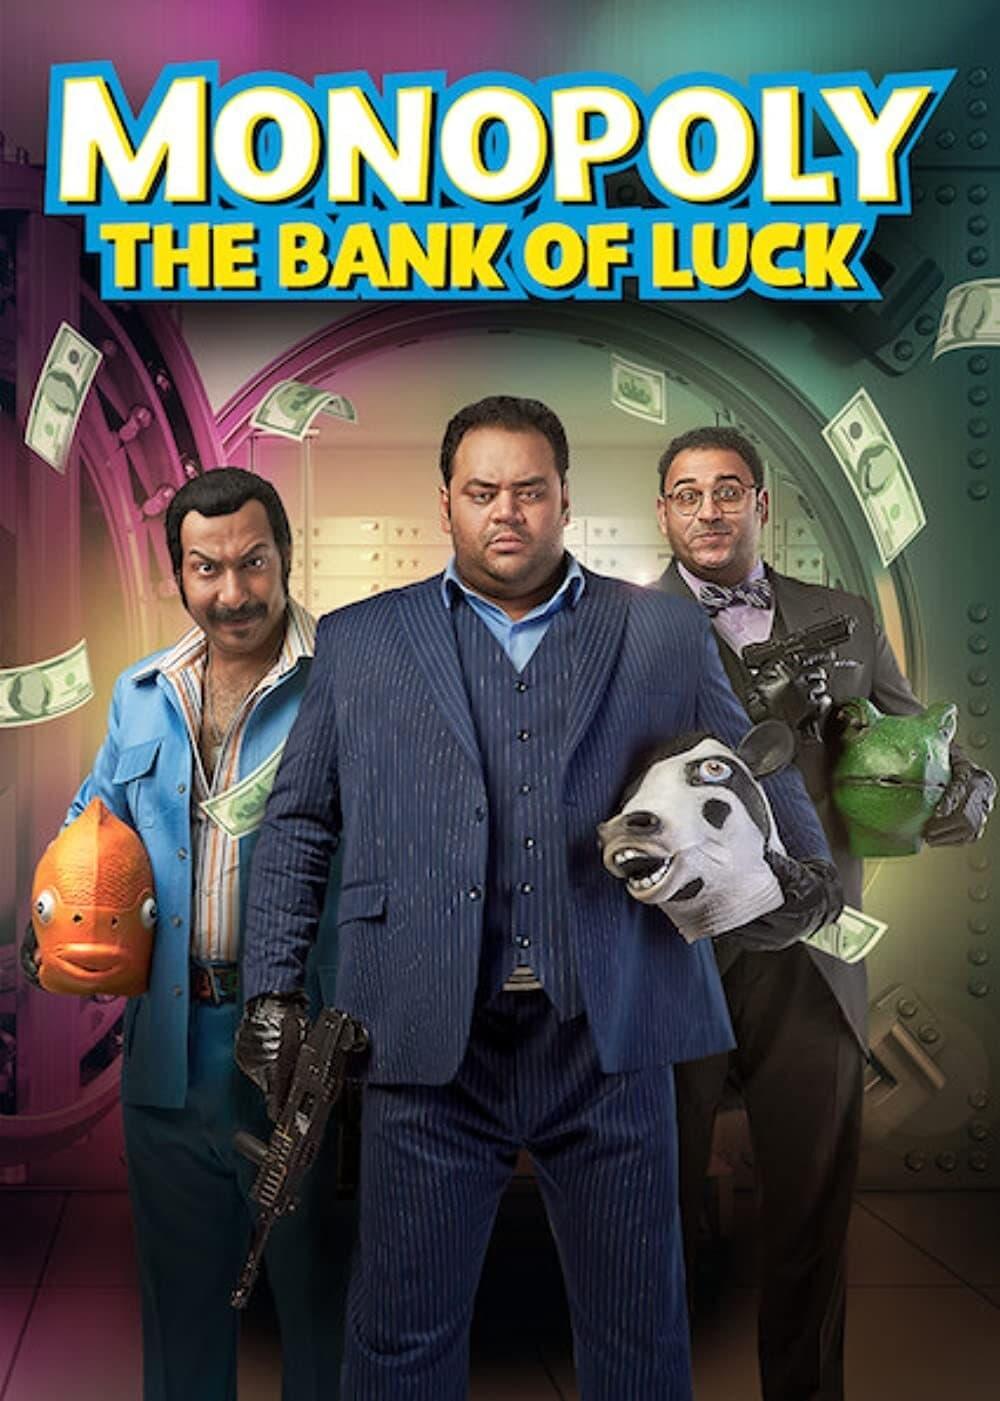 La Banque de la chance